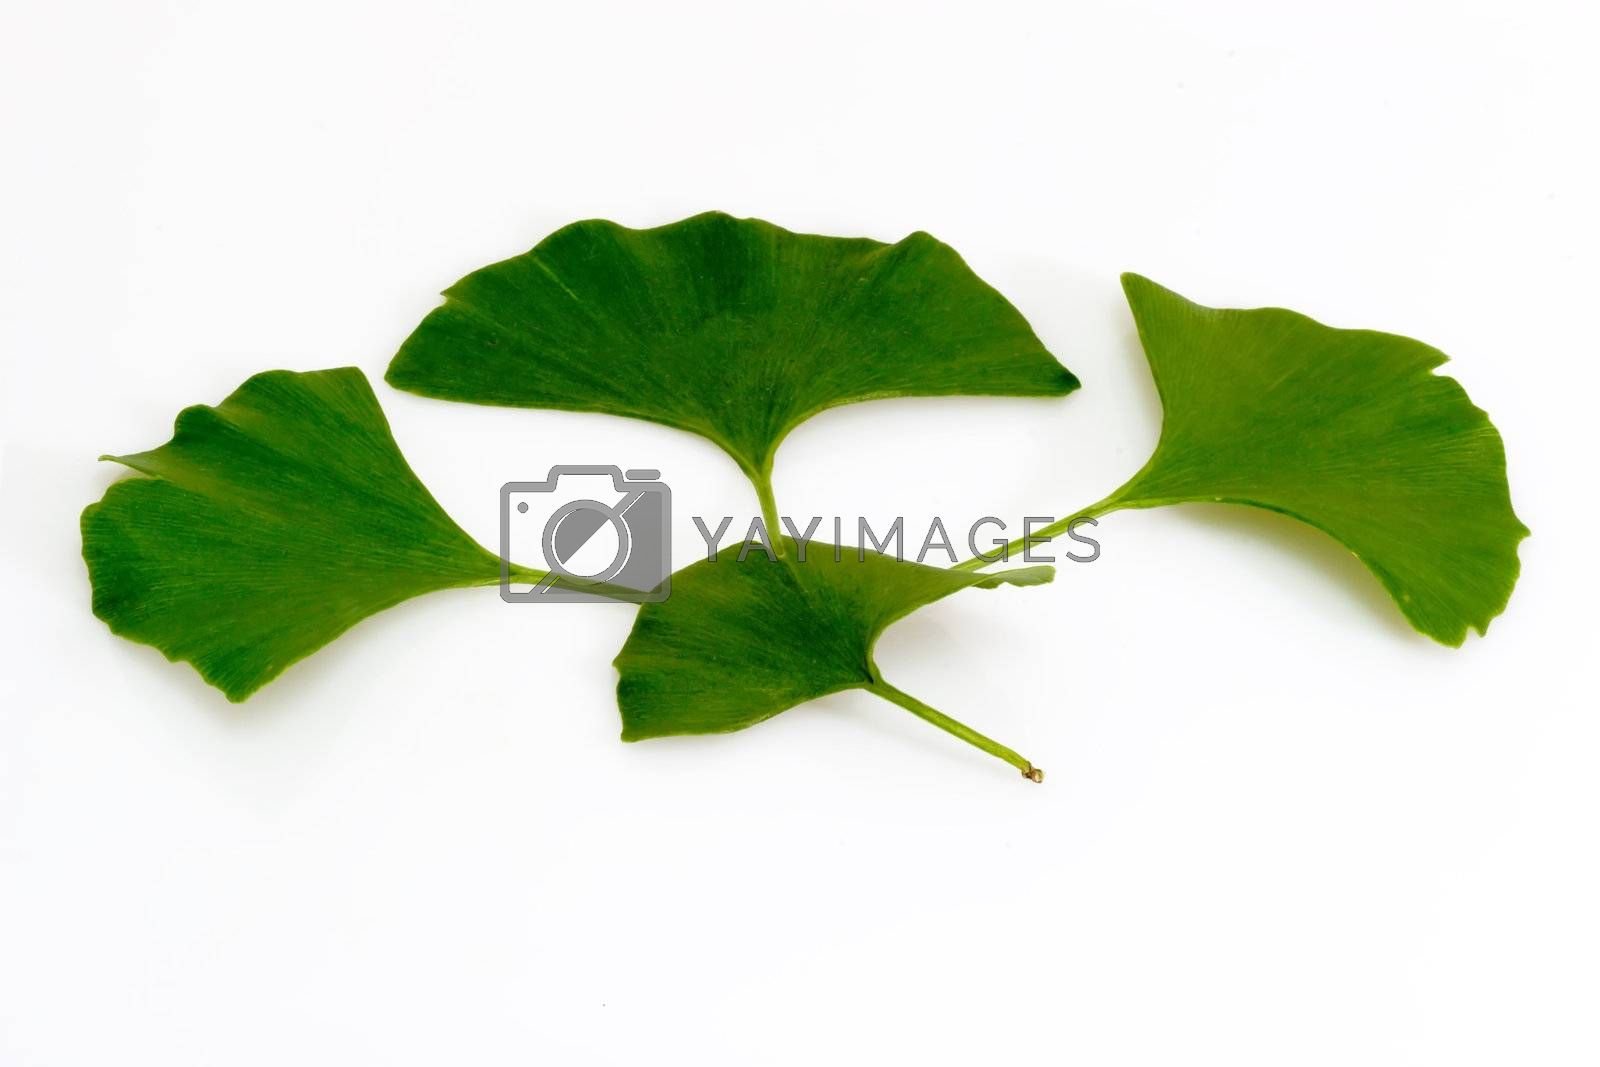 Ginkgo biloba leafs on bright background.